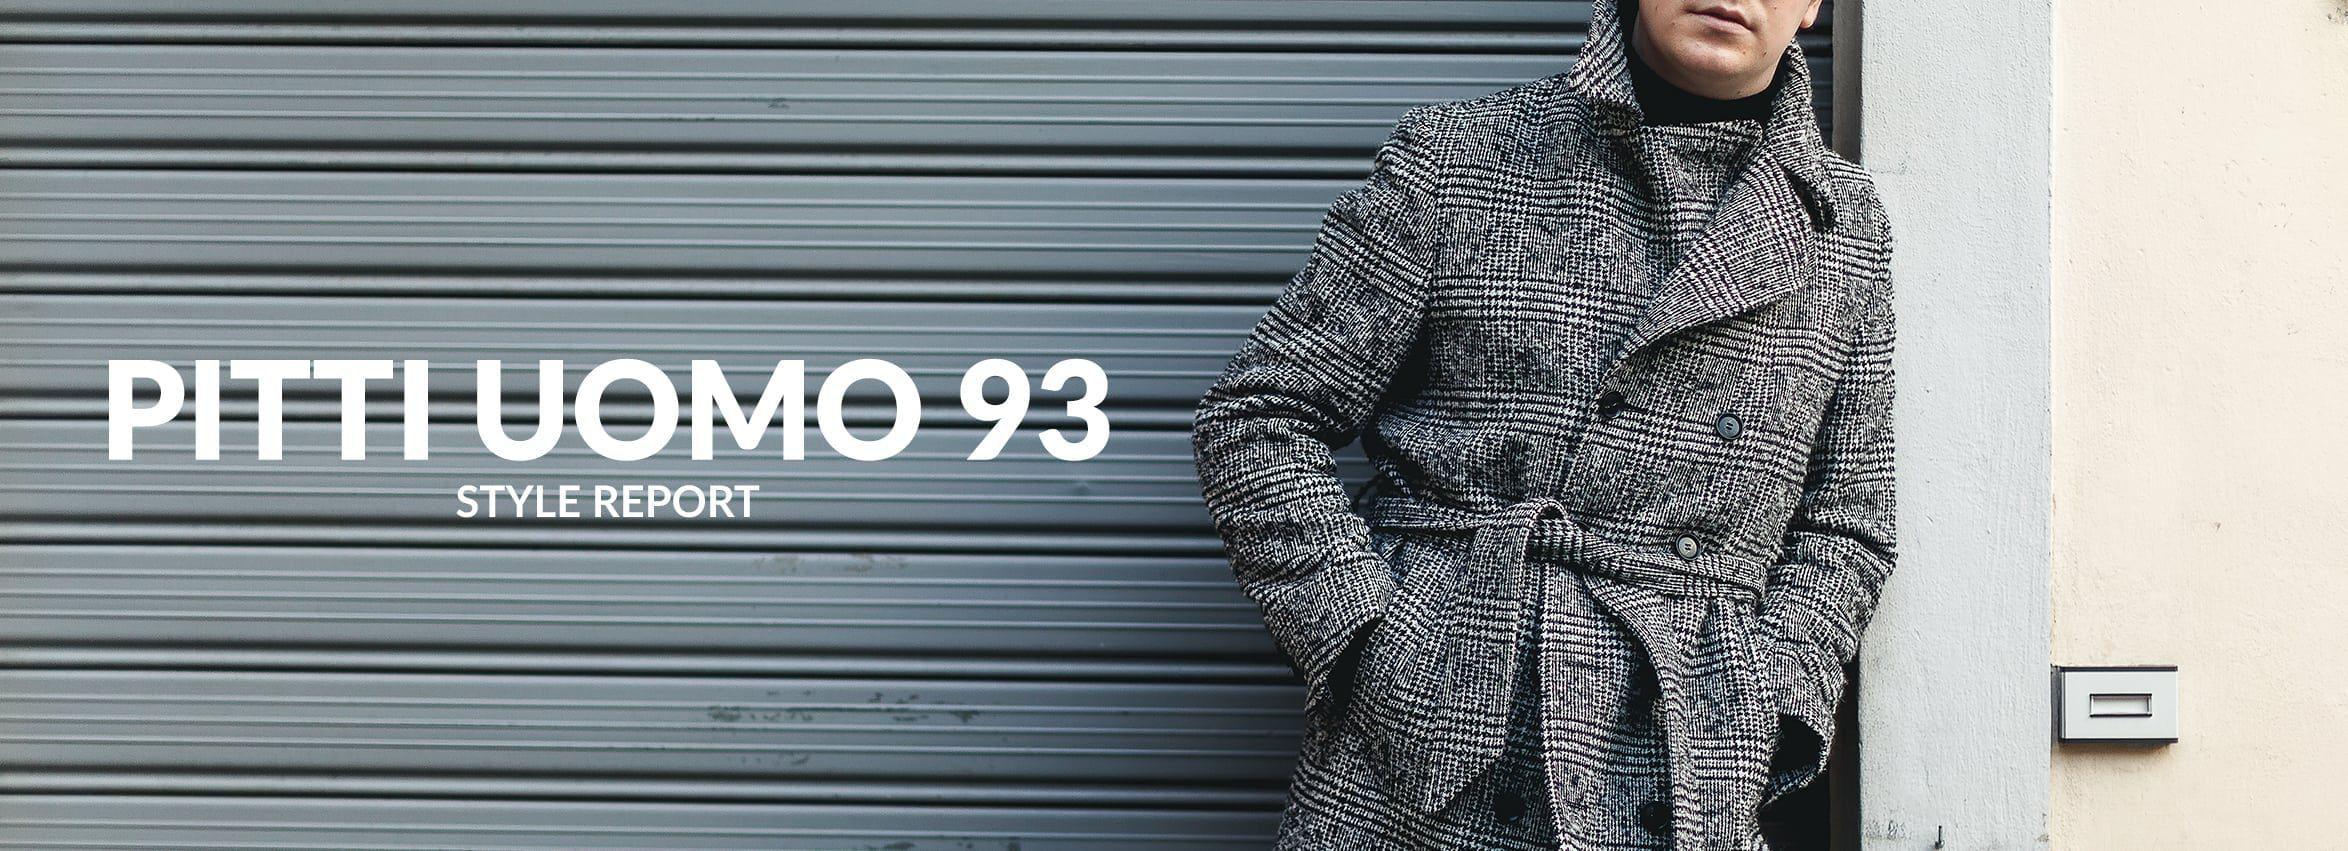 Pitti Uomo 93 Style Report at Baltzar